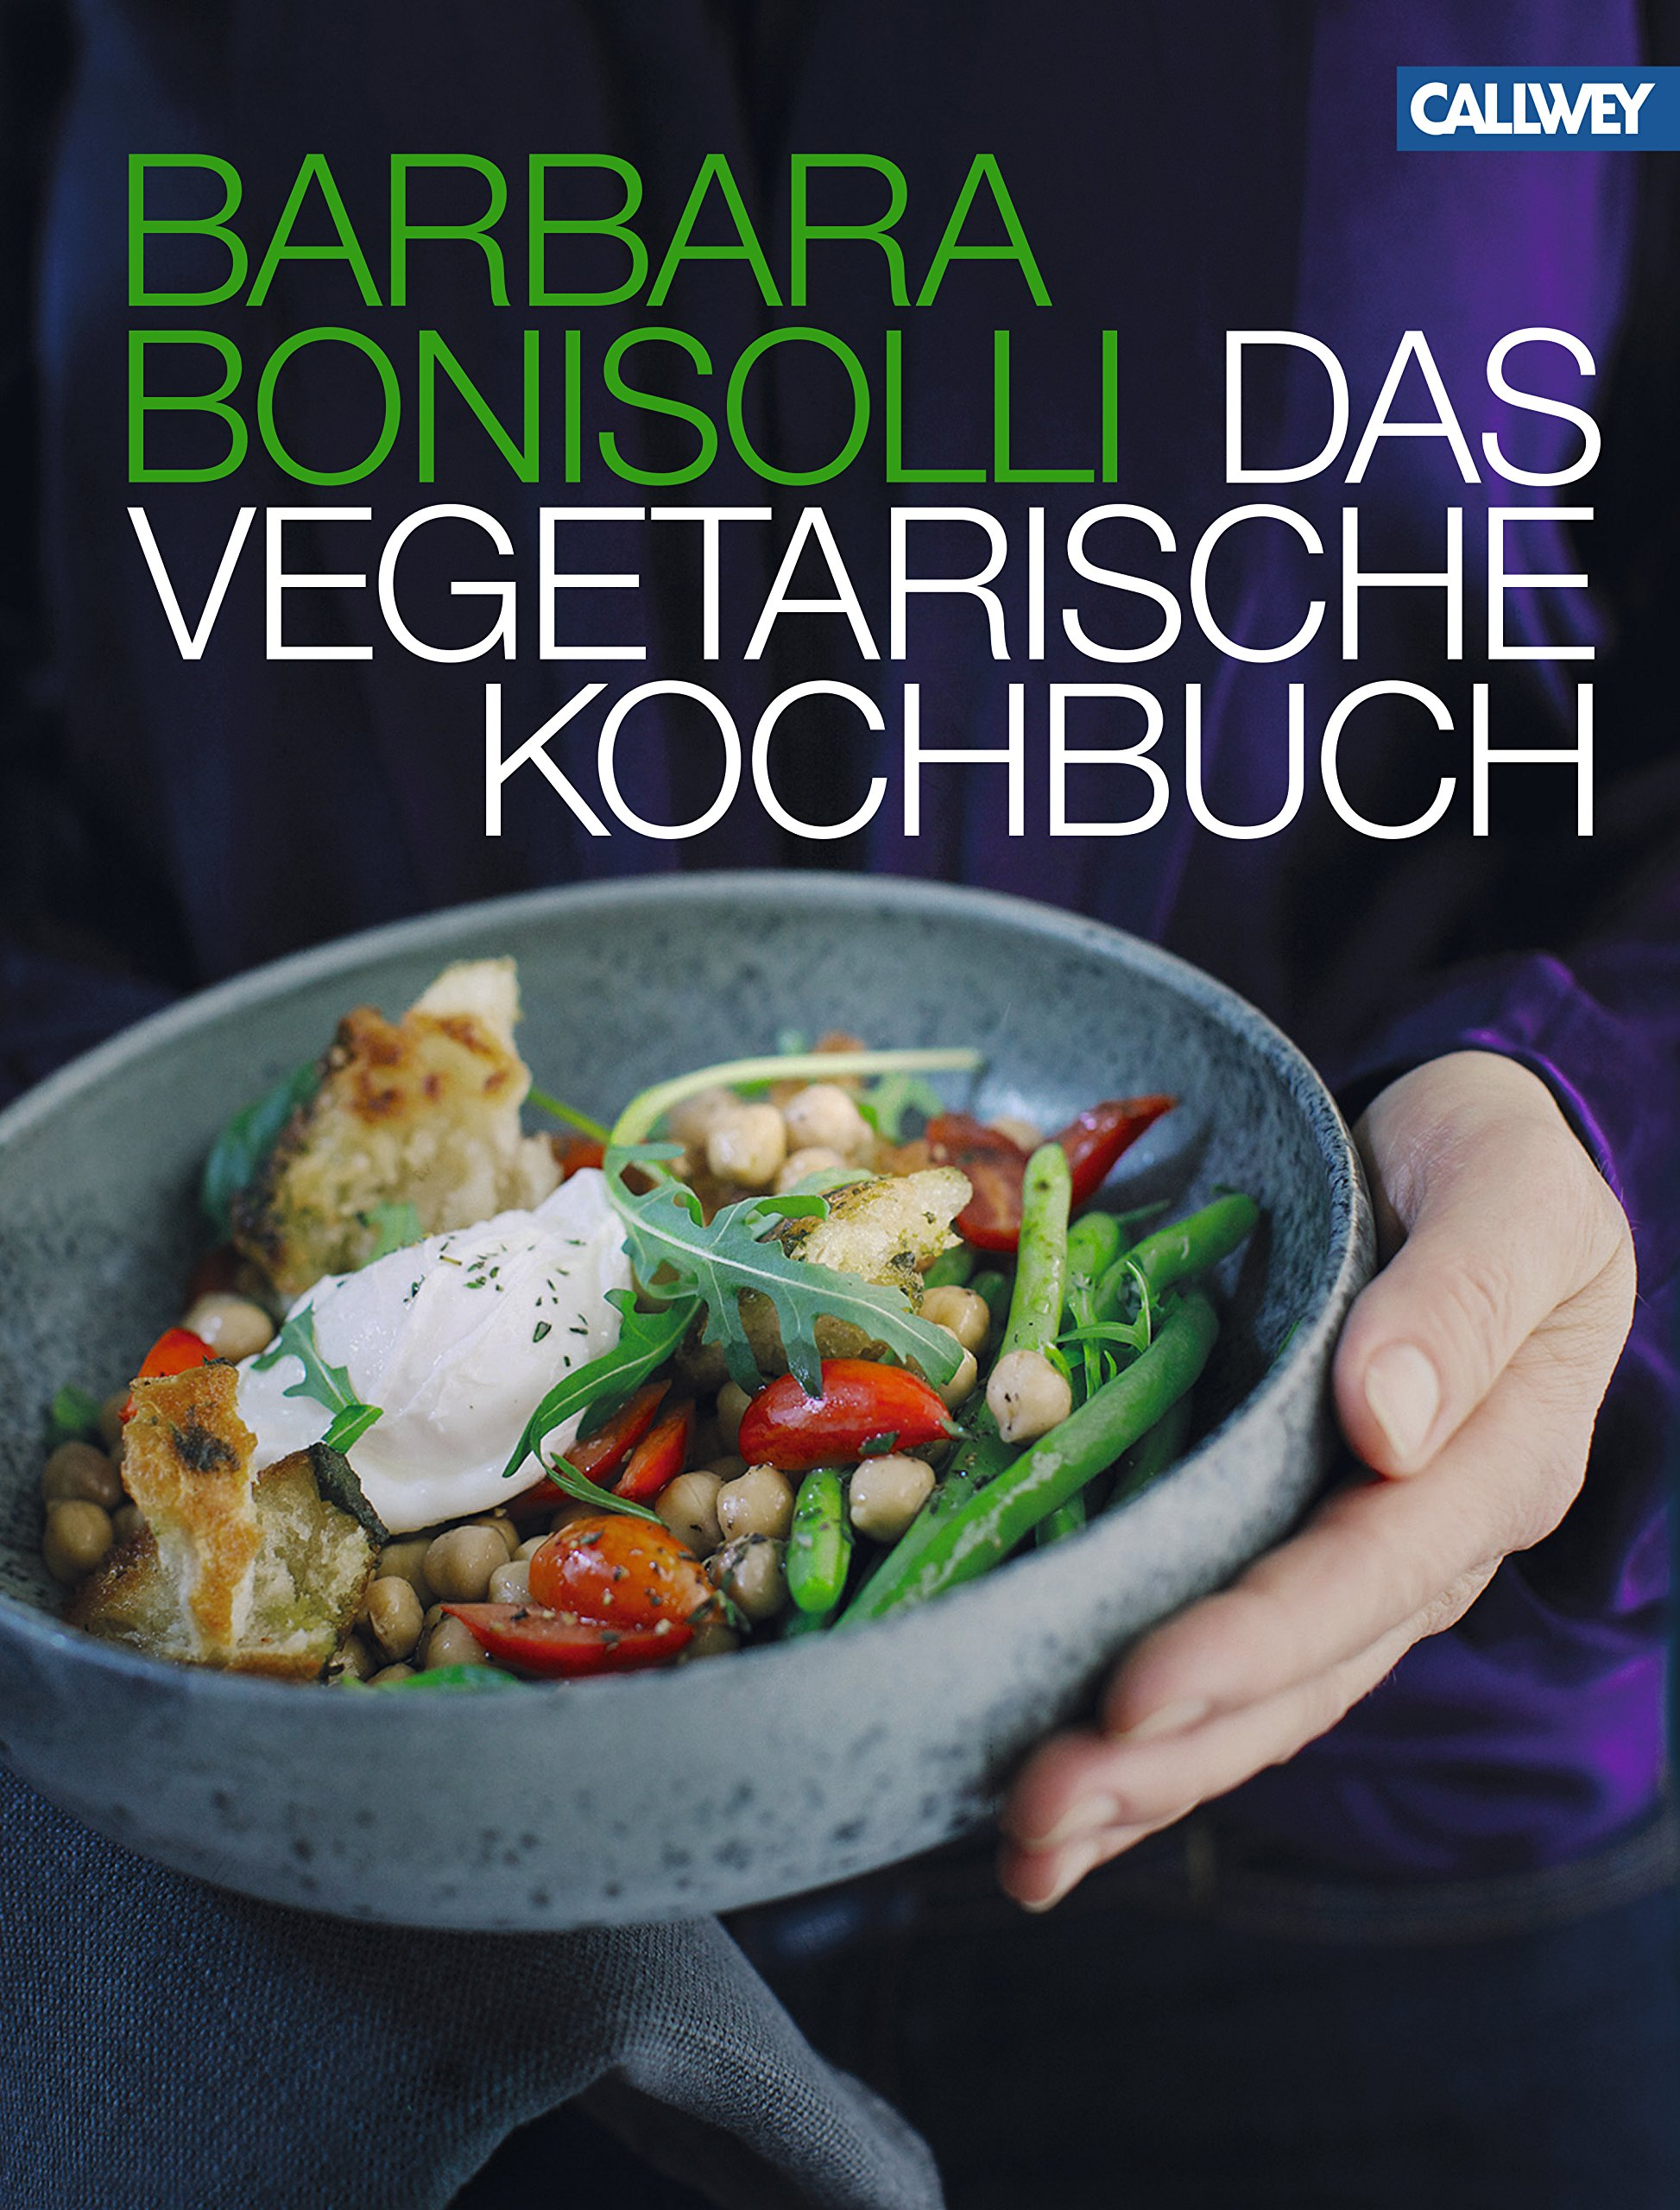 Das vegetarische Kochbuch